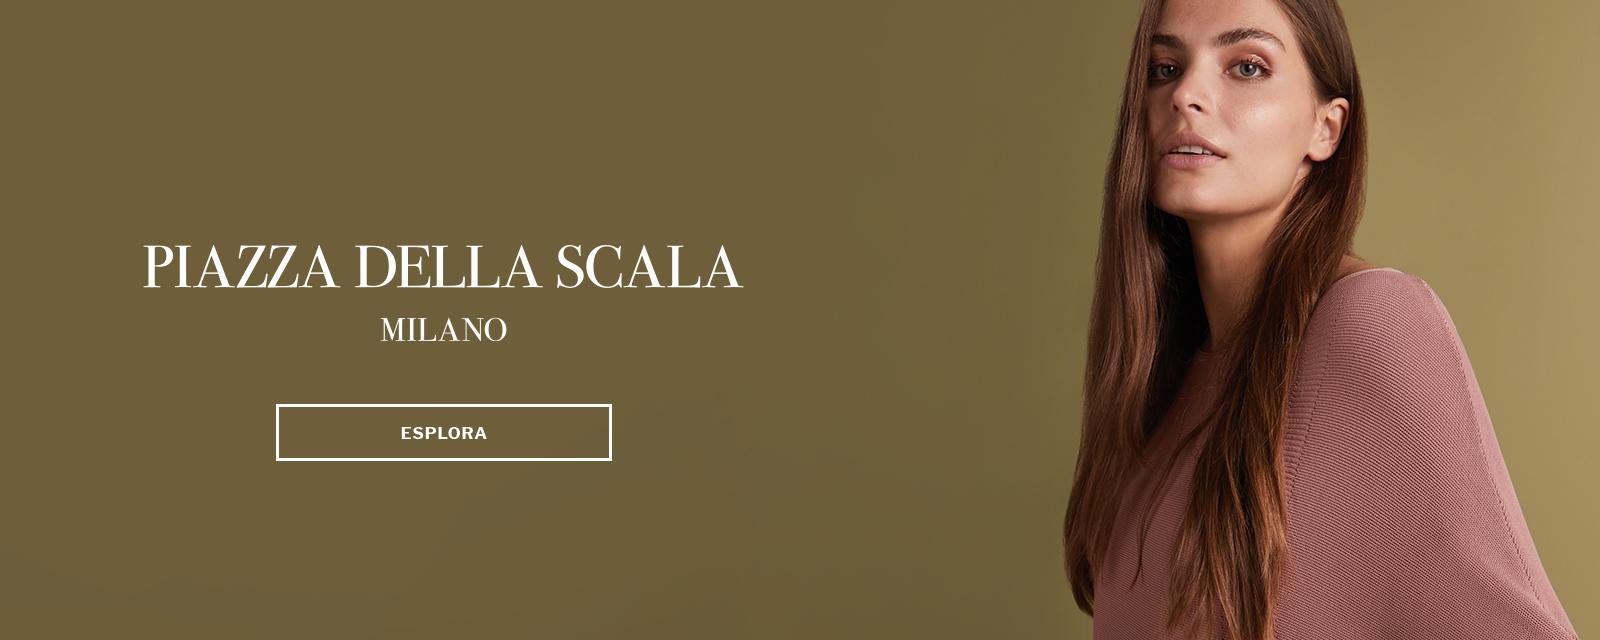 elena mirò new collection